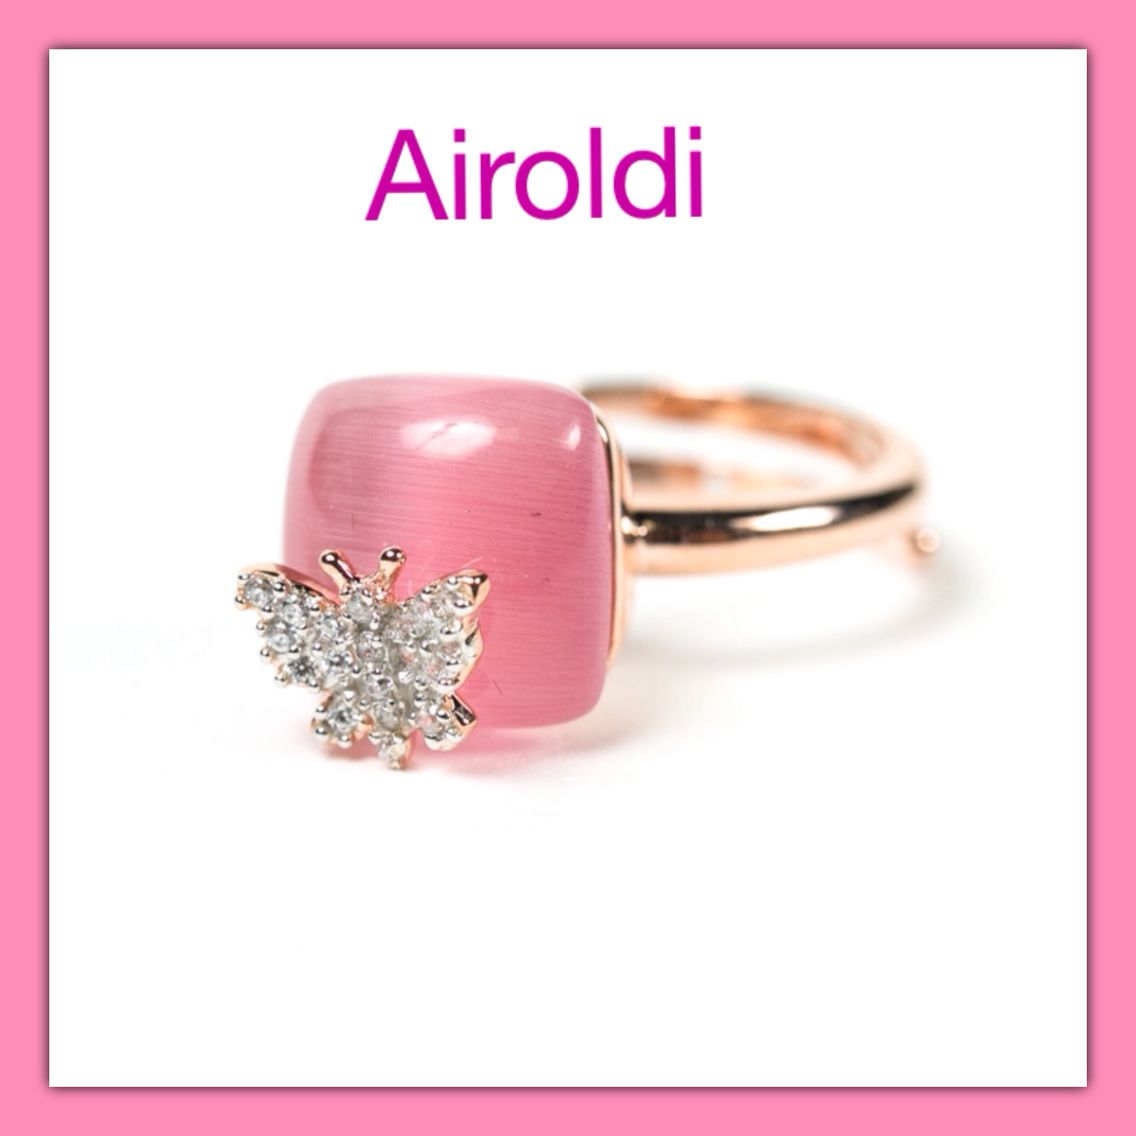 Anello in Argento e zircone Airoldi www.airoldifashion.com | bijoux ...